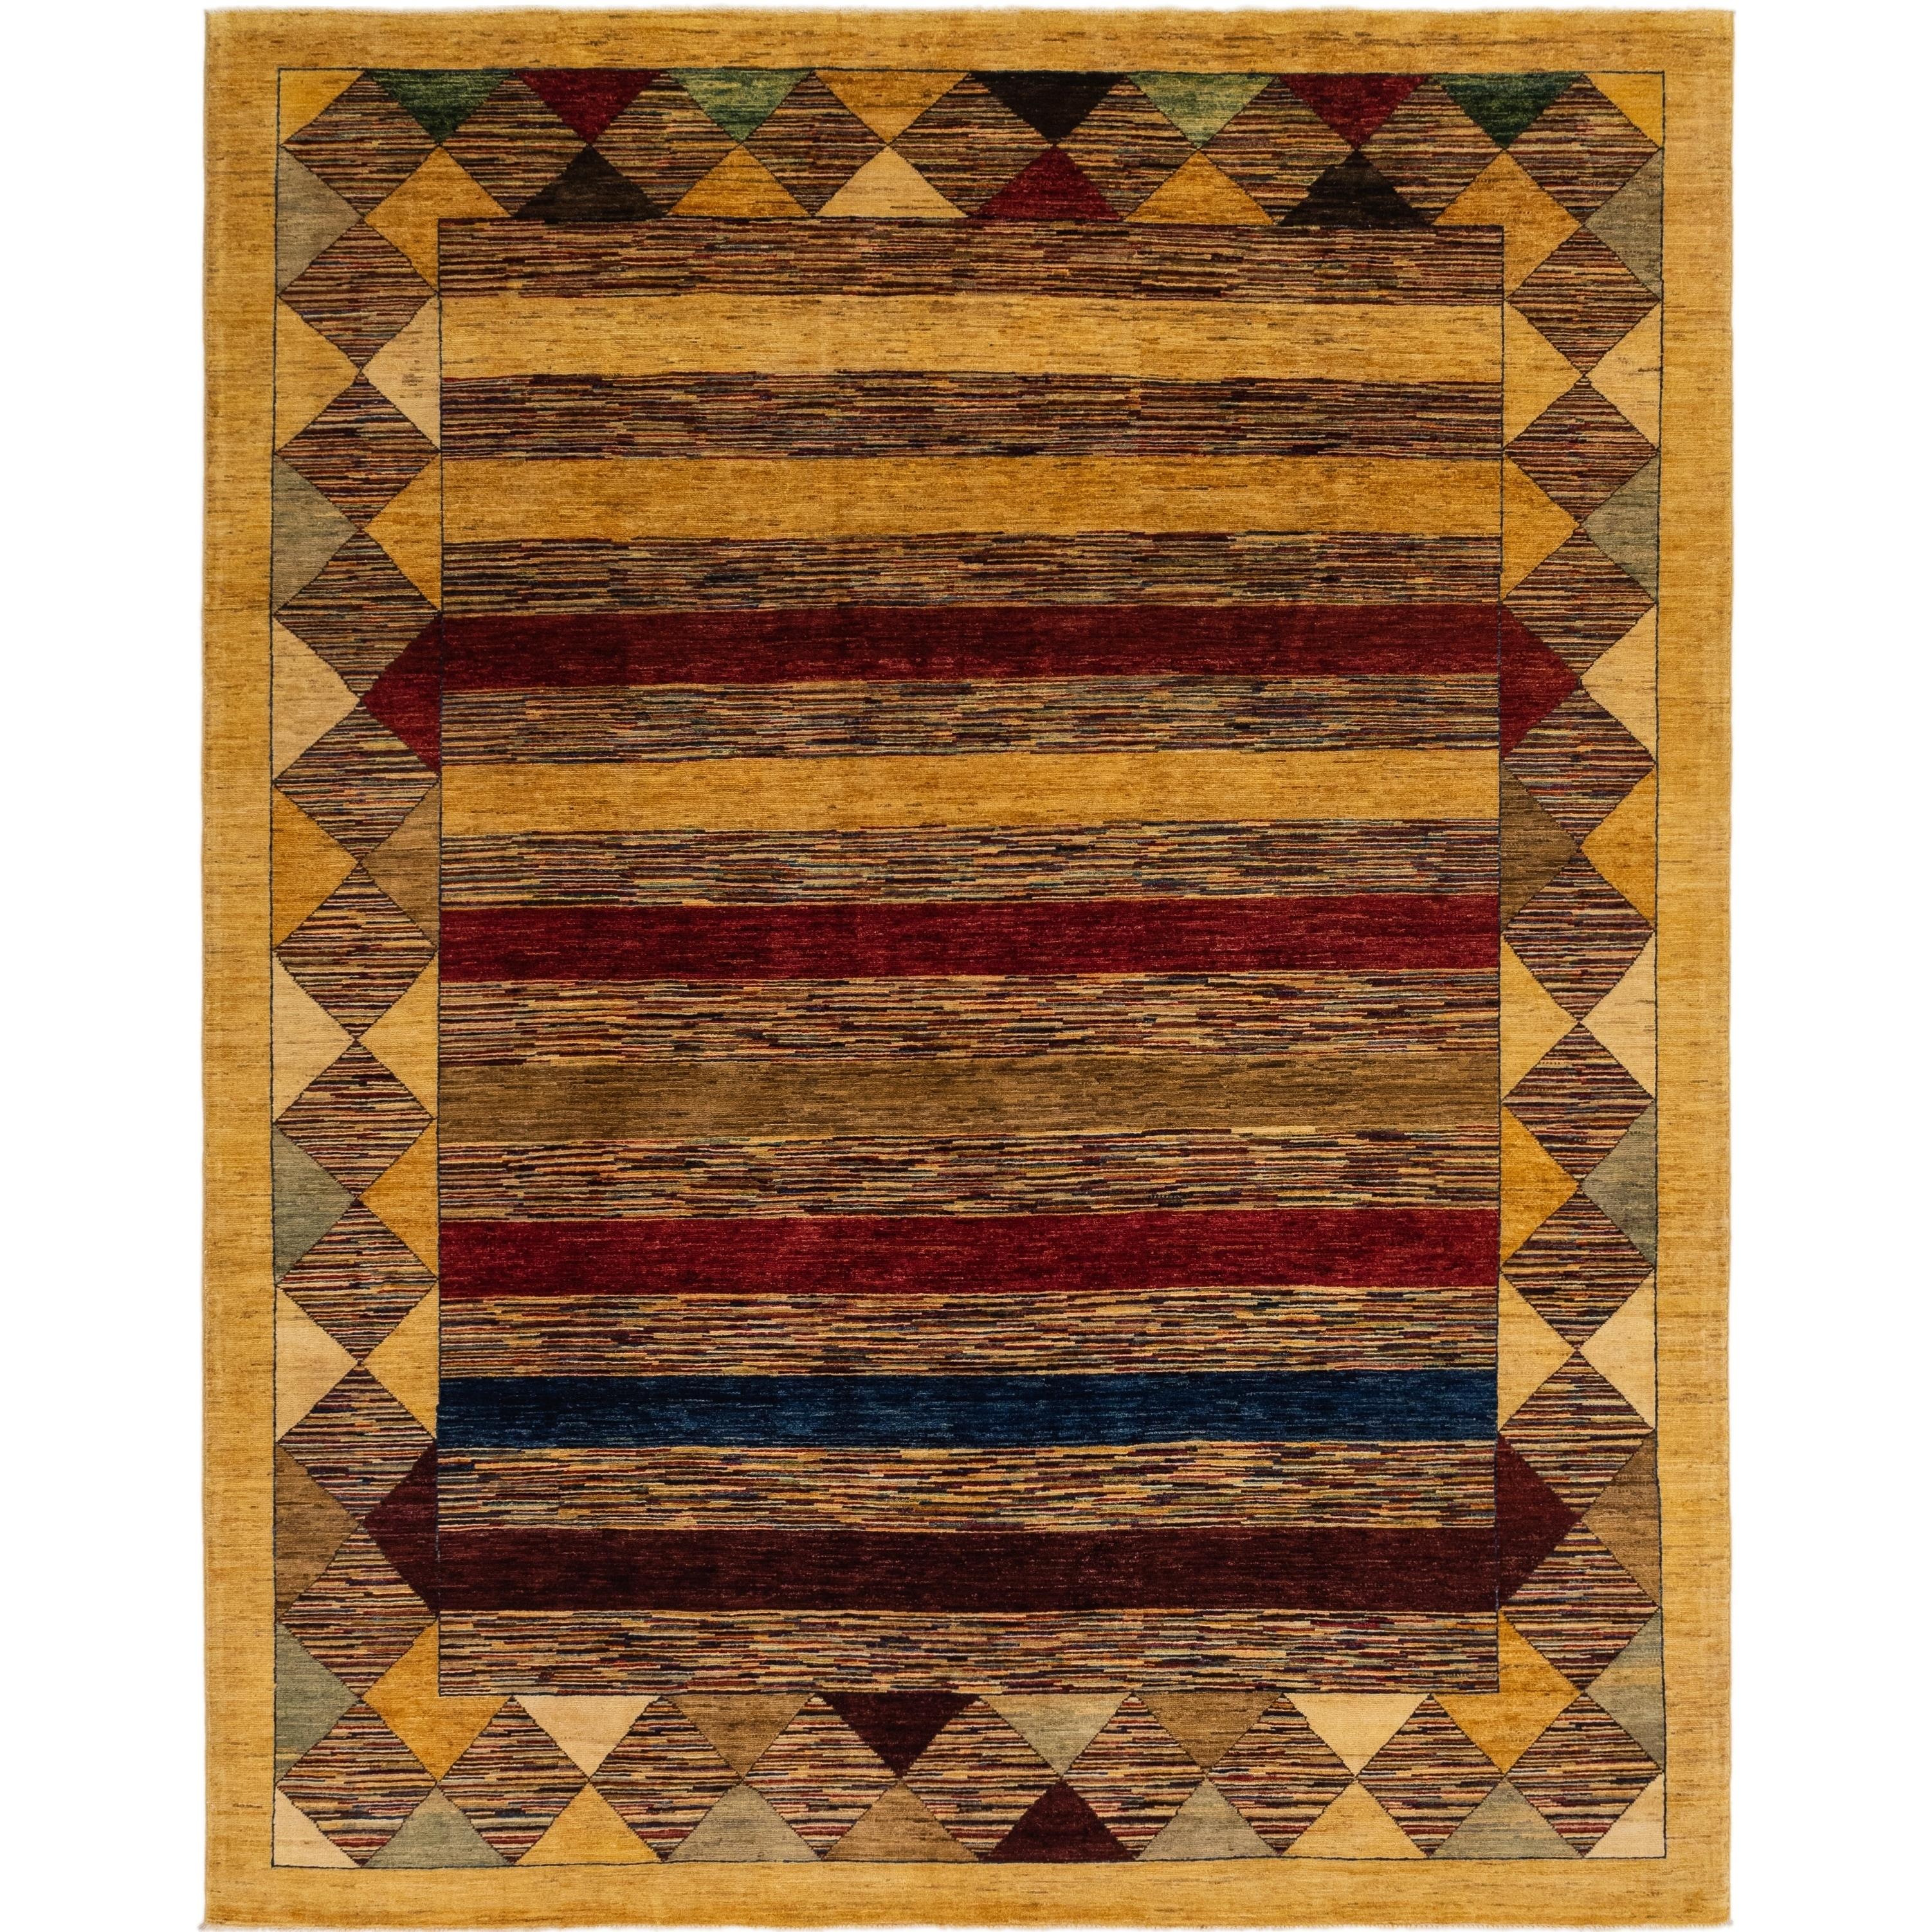 Hand Knotted Kashkuli Gabbeh Wool Area Rug - 9 x 11 5 (Multi - 9 x 11 5)